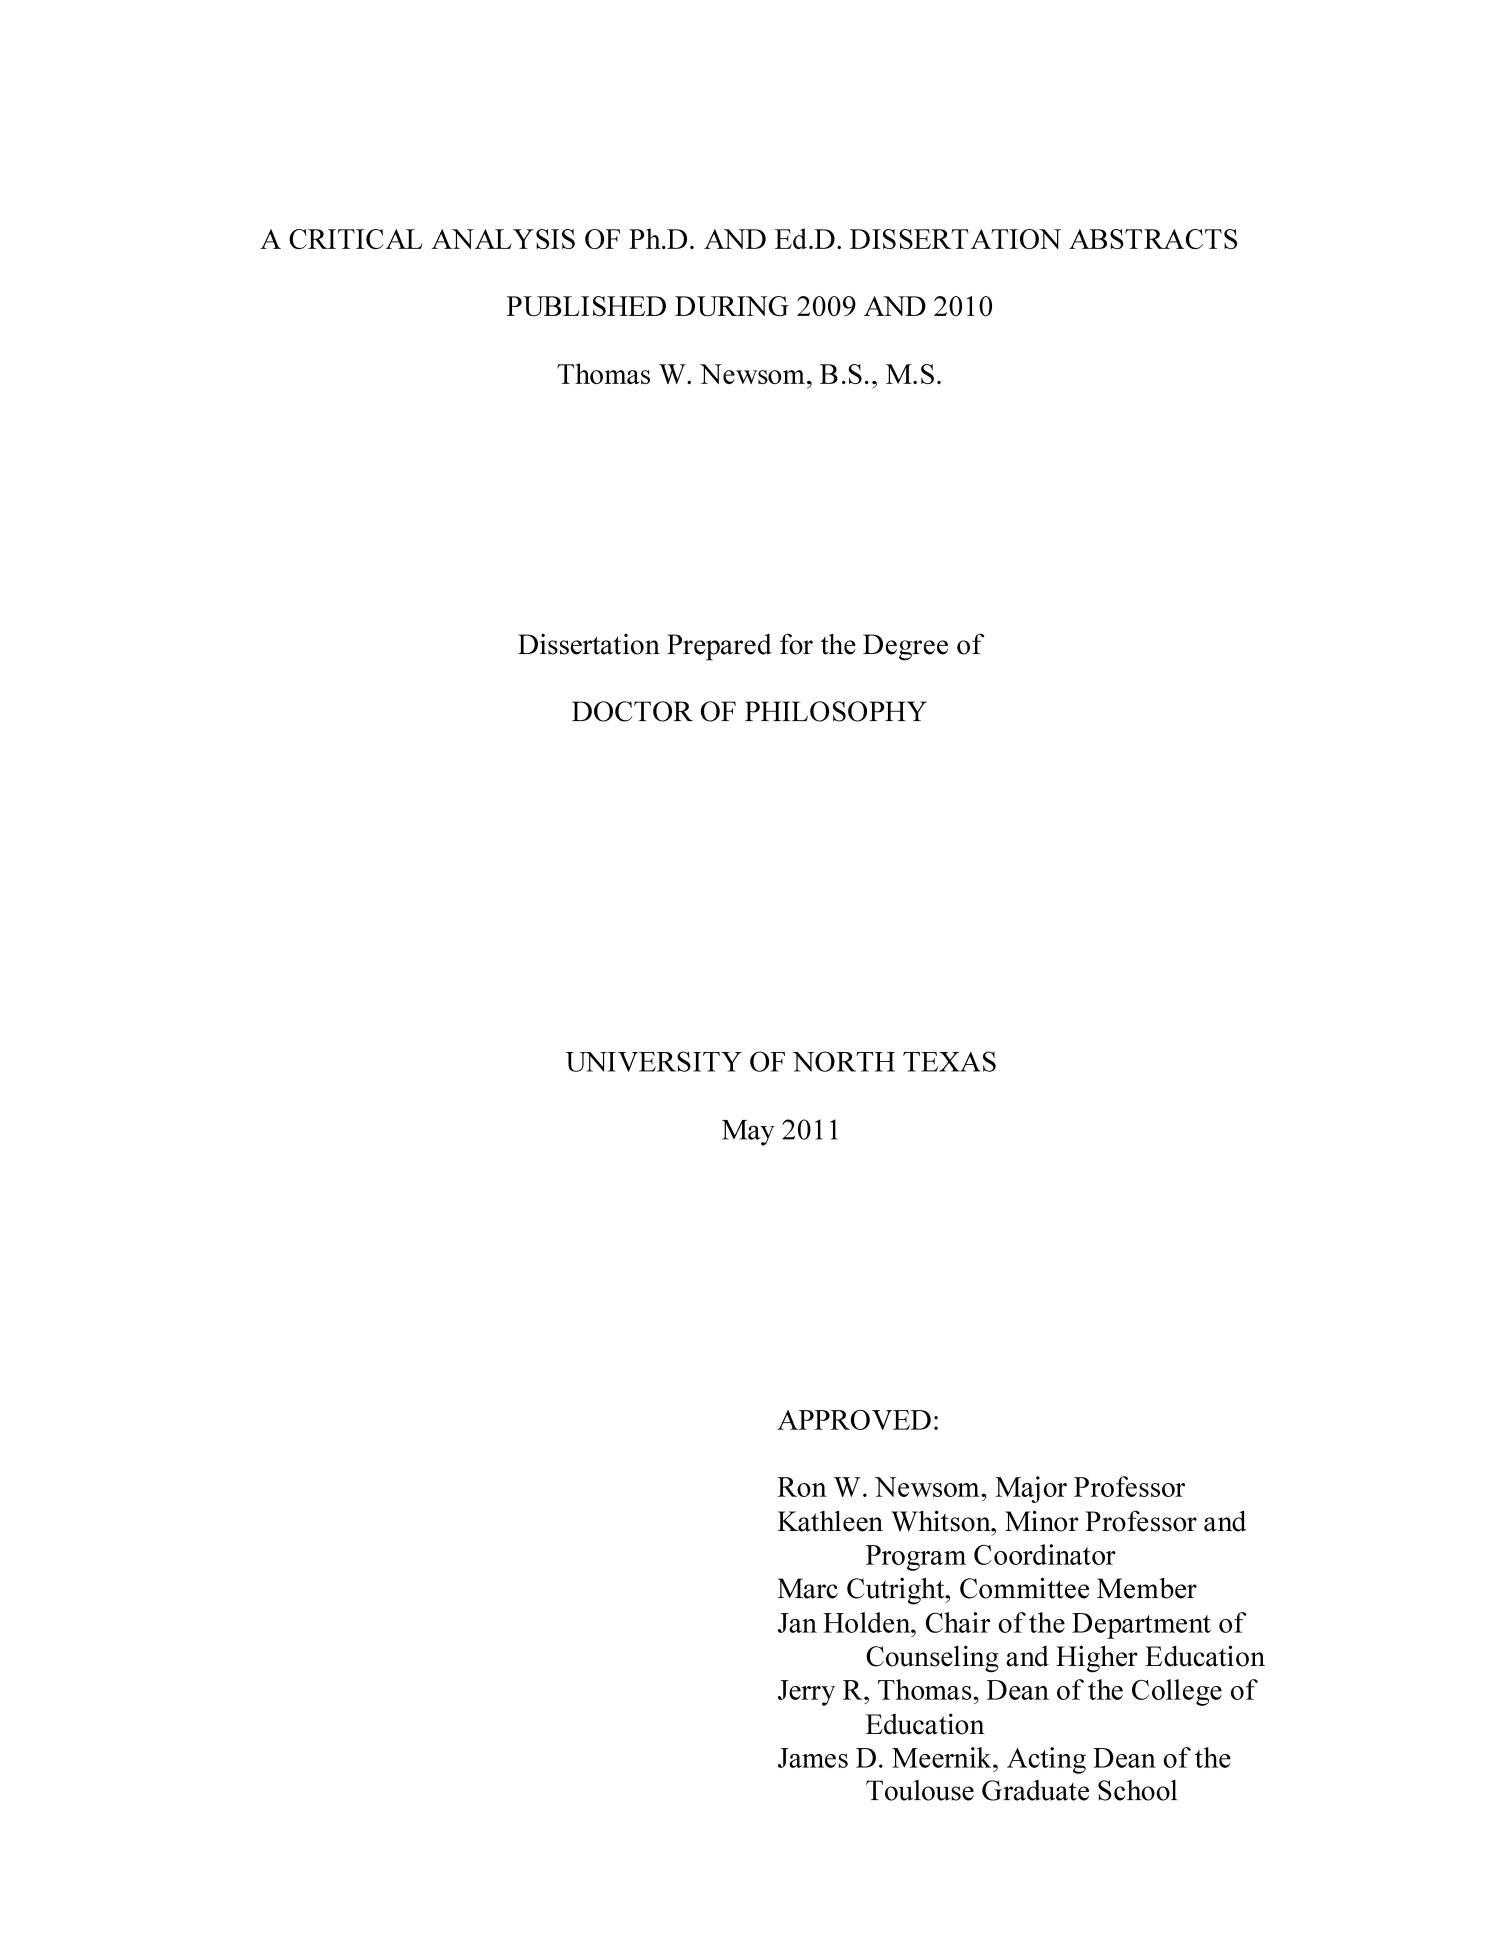 9+ Critical Essay Examples - PDF | Examples